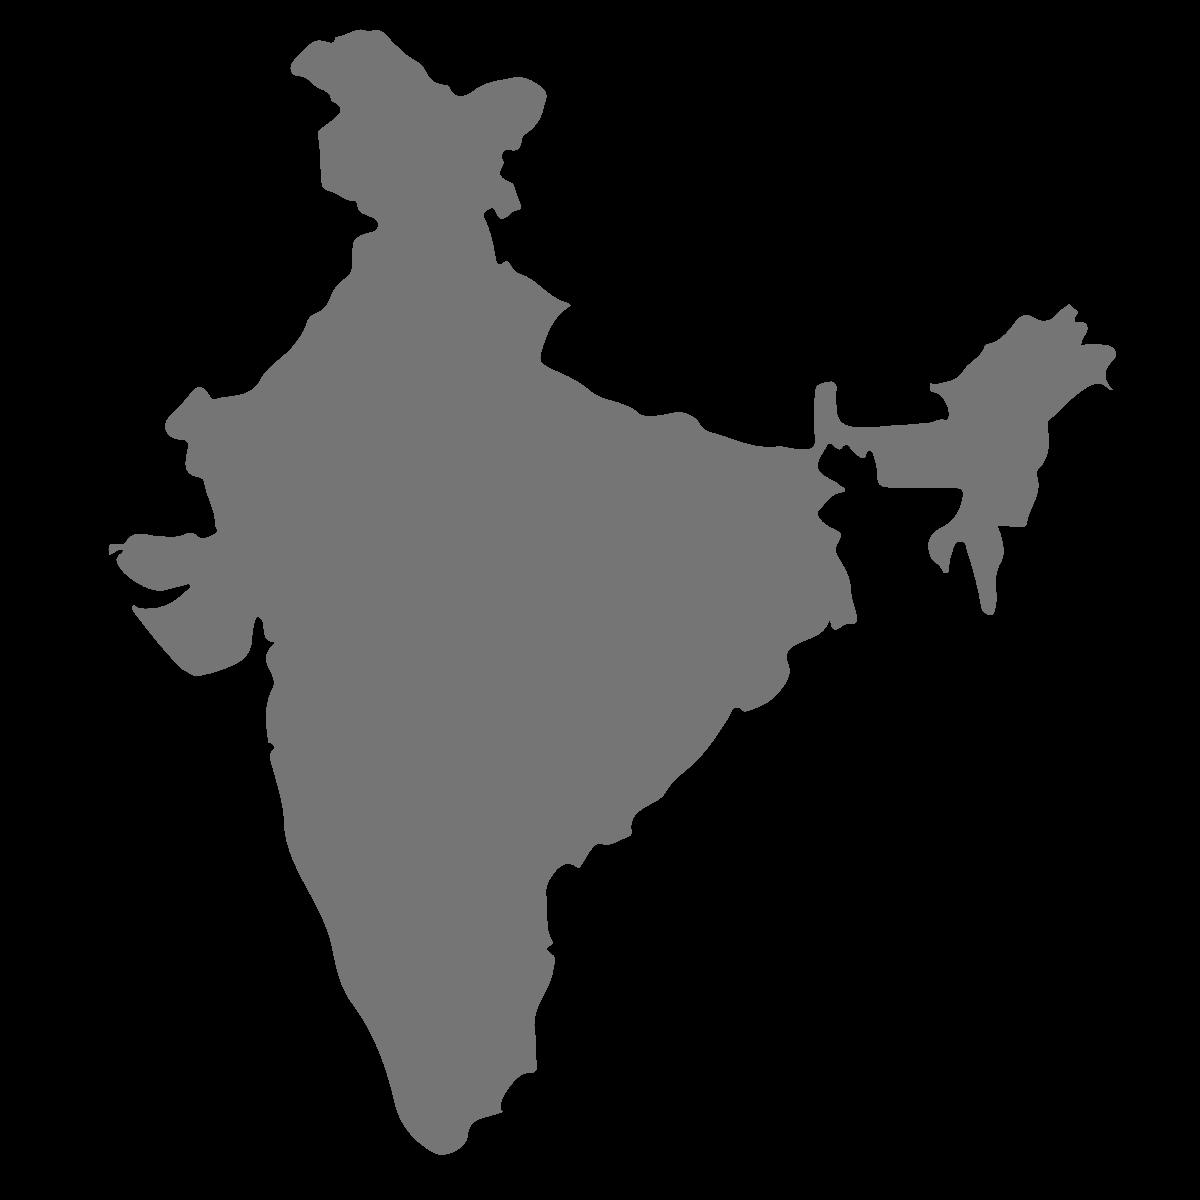 India PNG-PlusPNG.com-1200 - India PNG